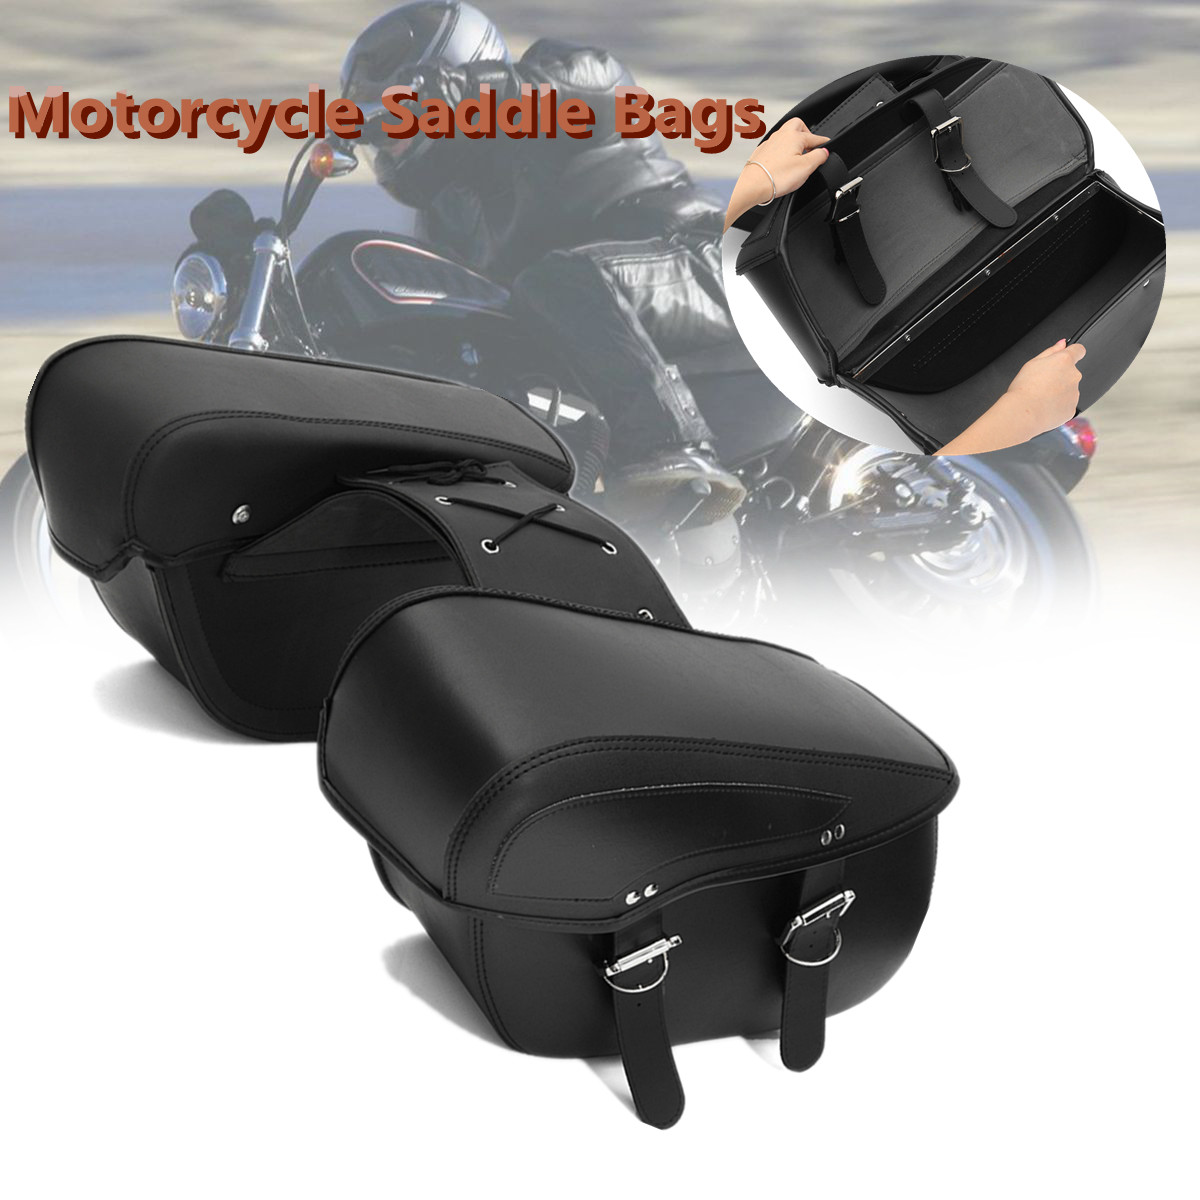 Luggage Saddle Bag Latch Covers 1993-2013 Harley Dresser Chrome FLH FLT